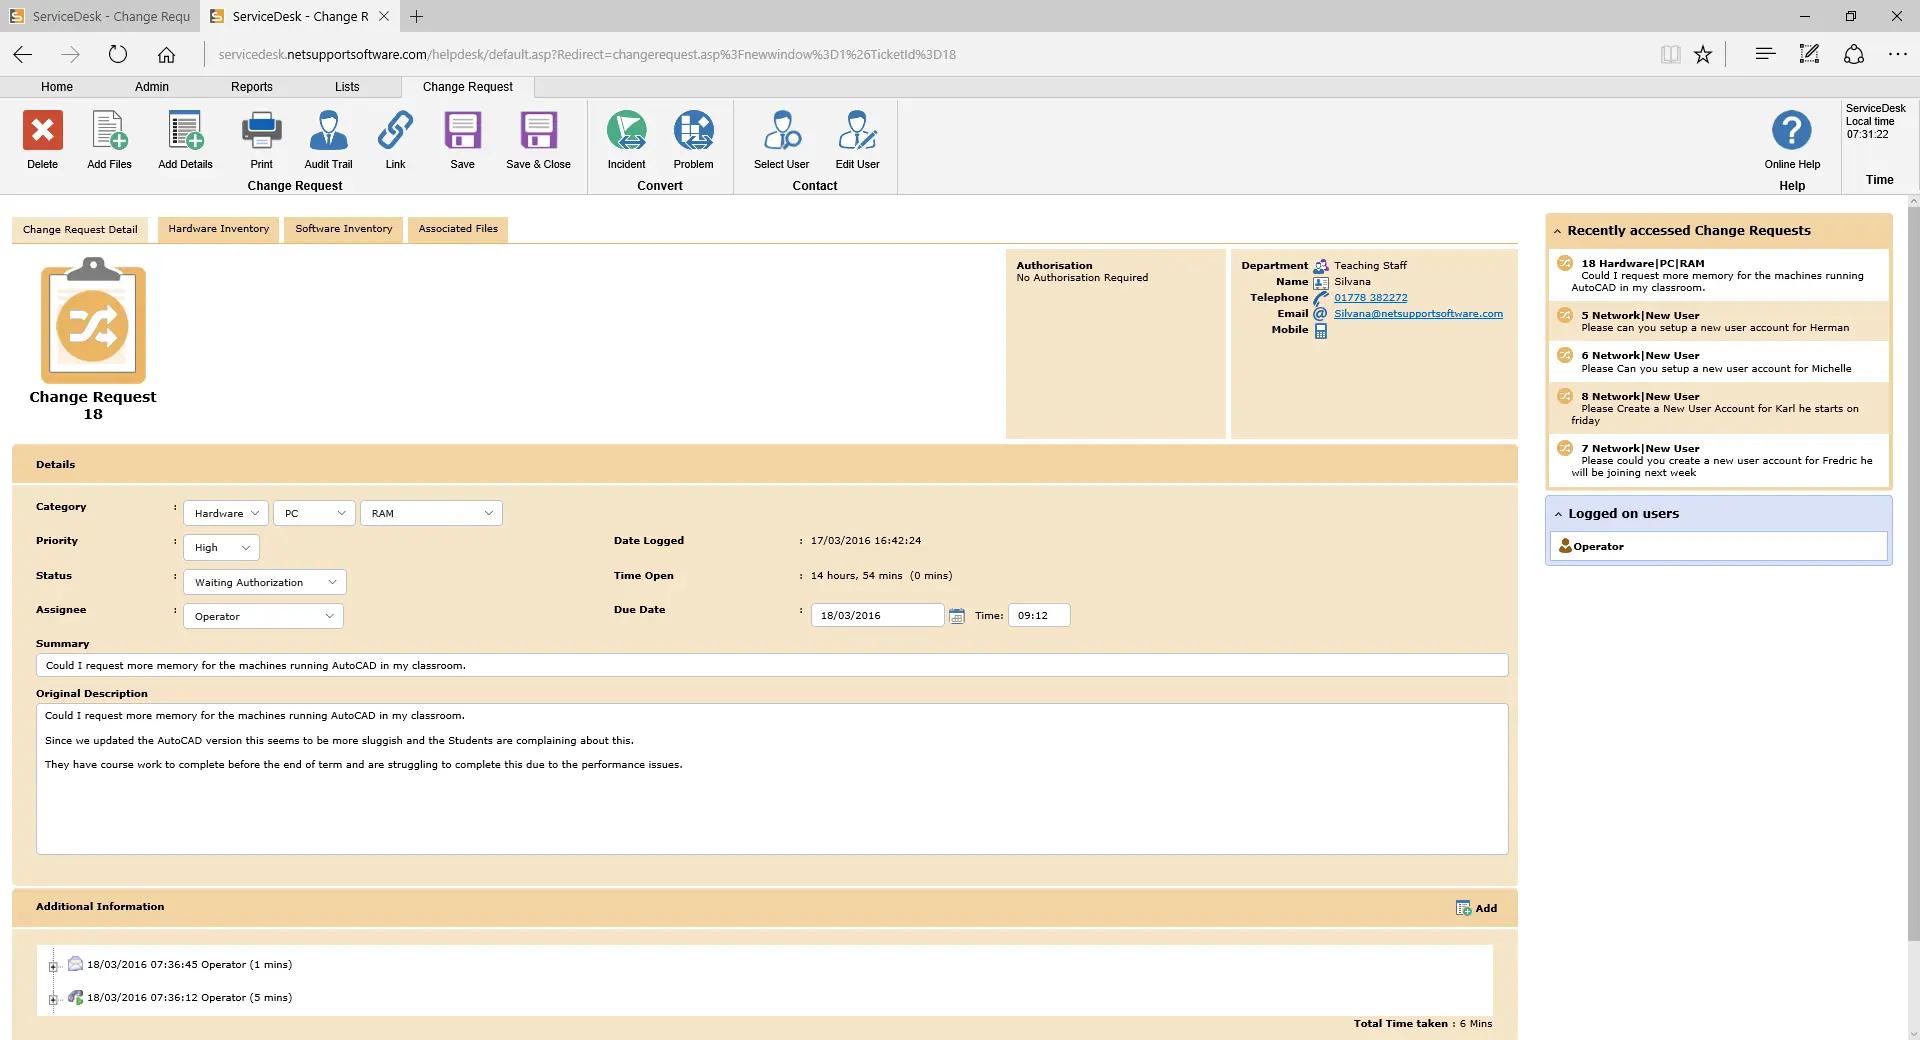 NetSupport ServiceDesk - Change Management view